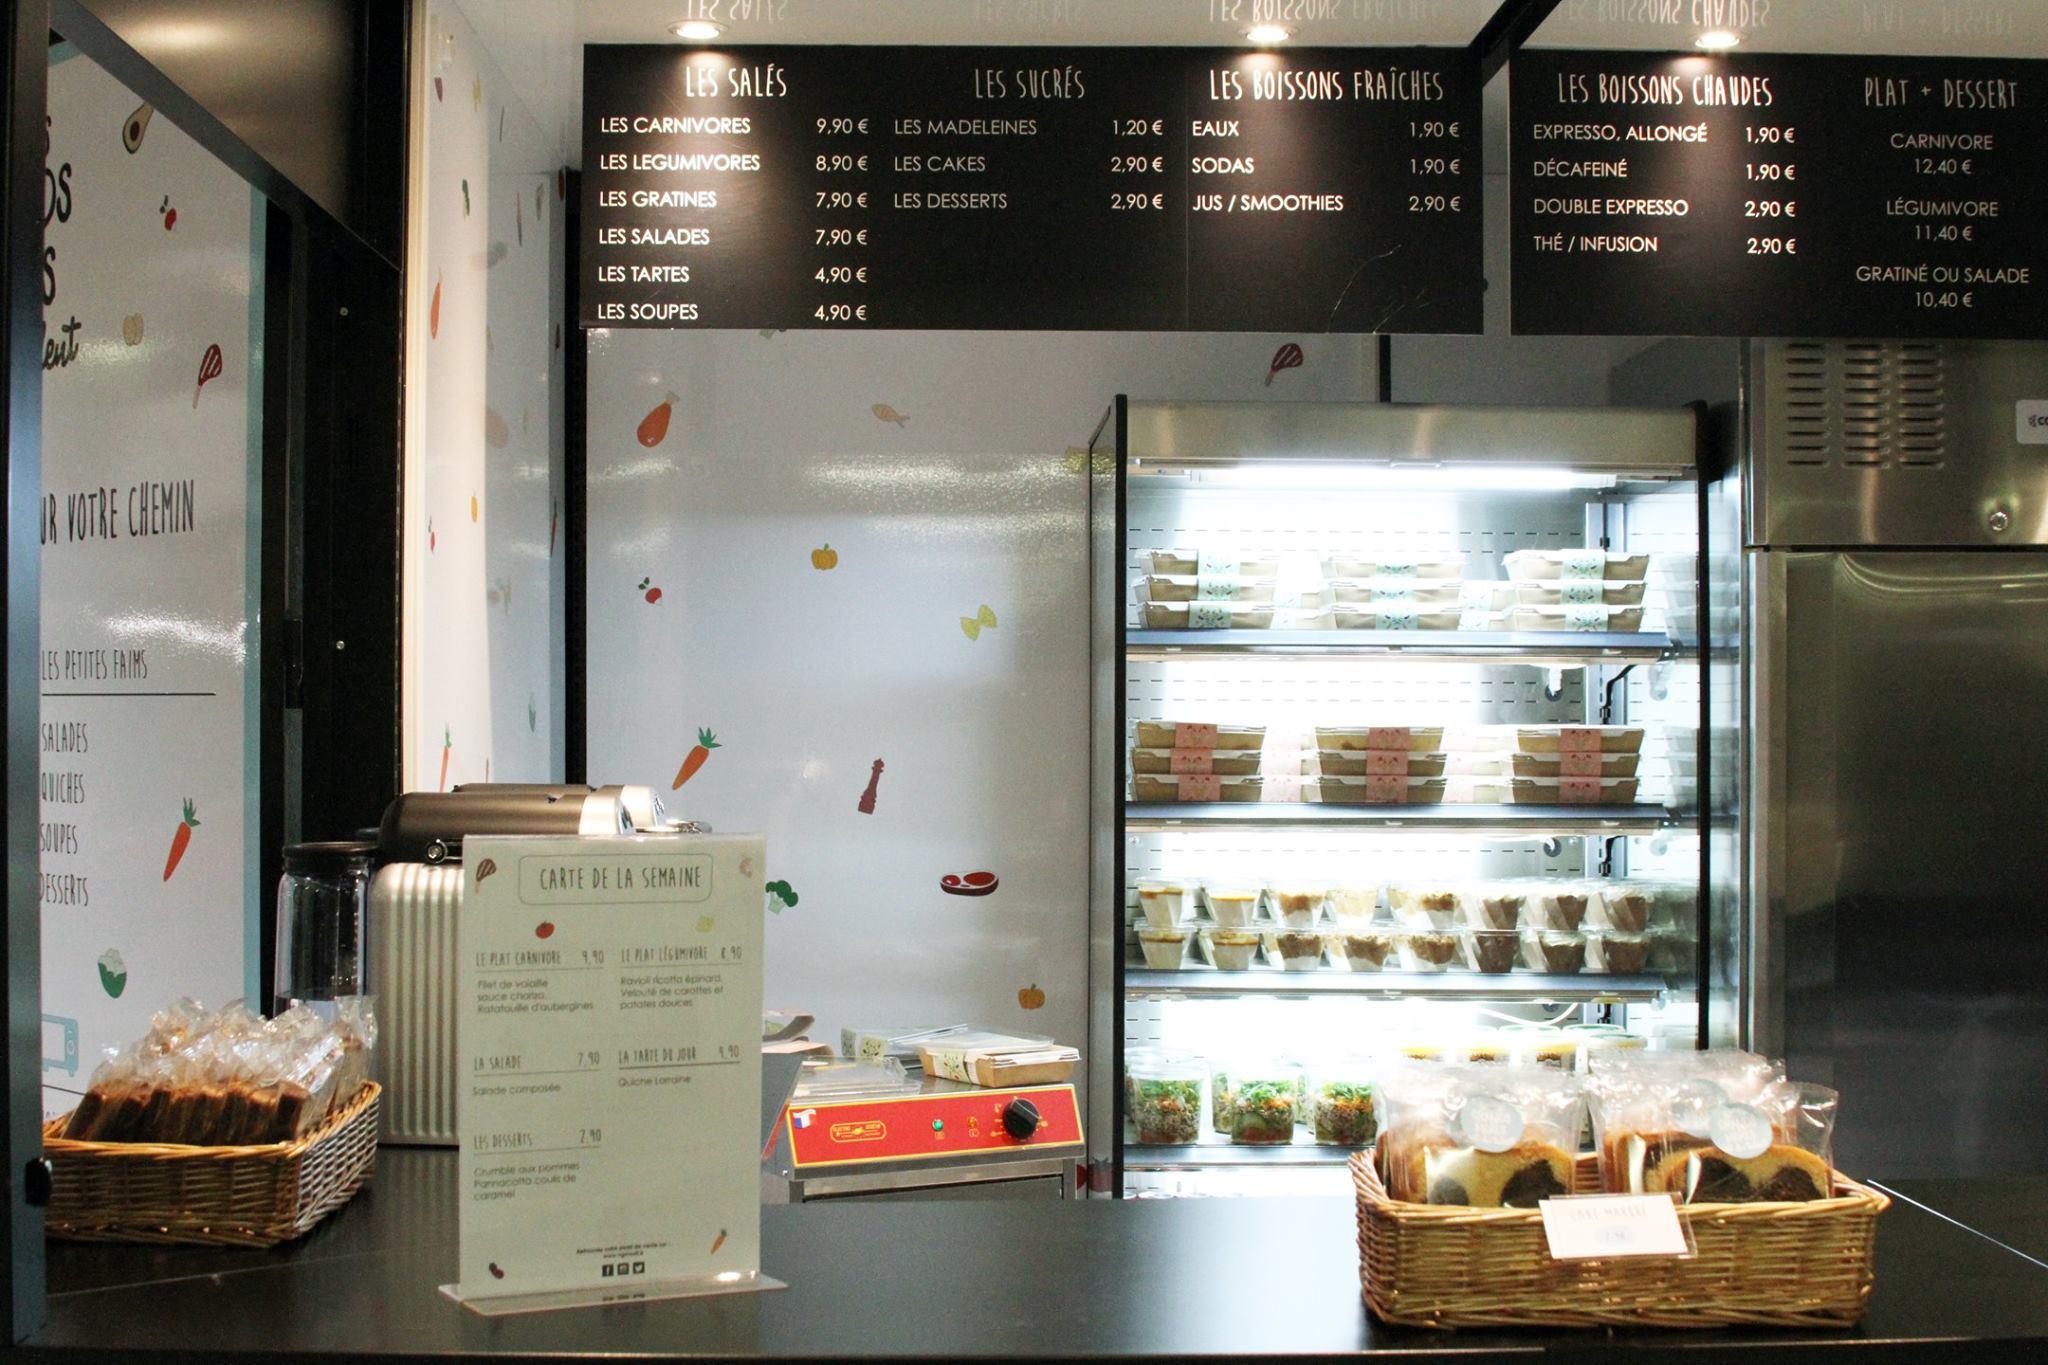 nos-grands-meres-ont-du-talent-cuisine-mamies-initiative-start-up-montparnasse